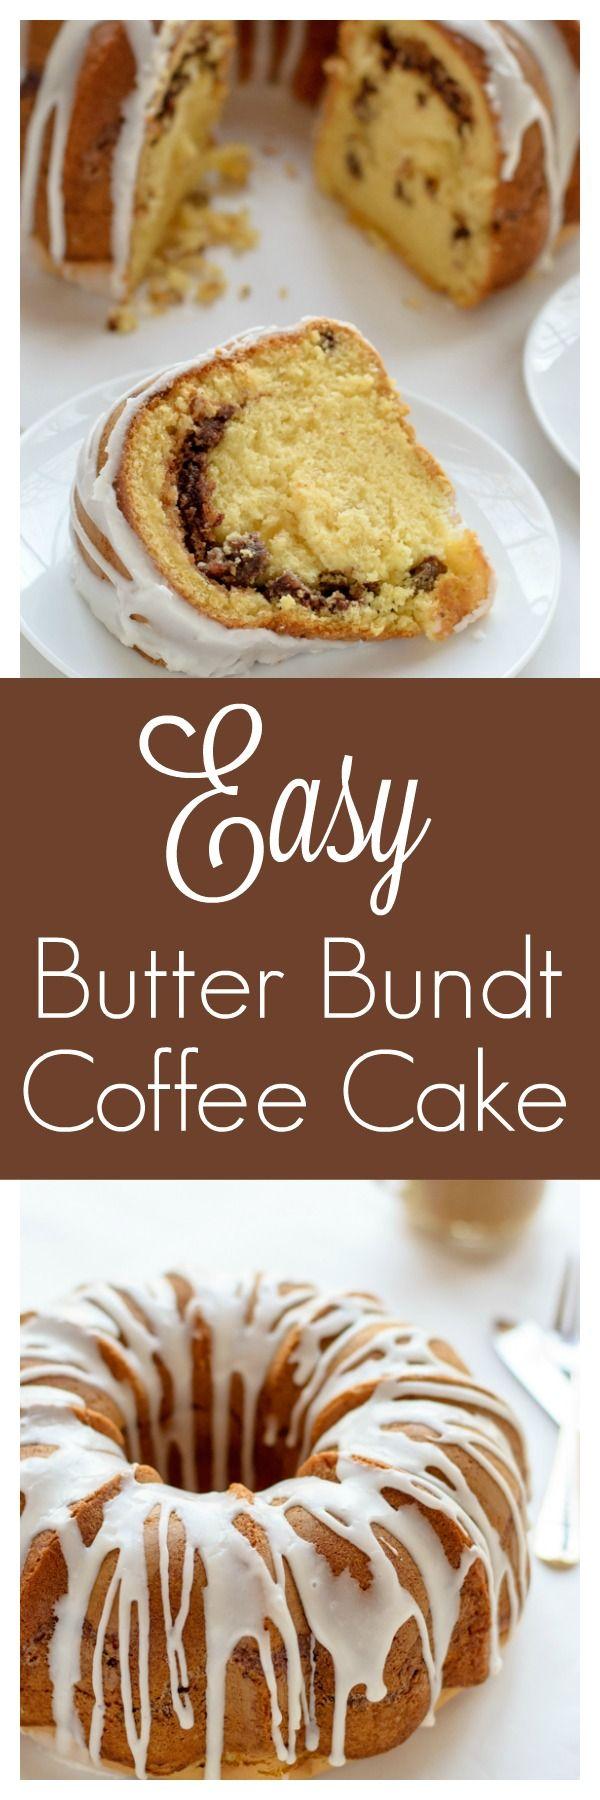 Butter Bundt Coffee Cake. Hands down the most moist